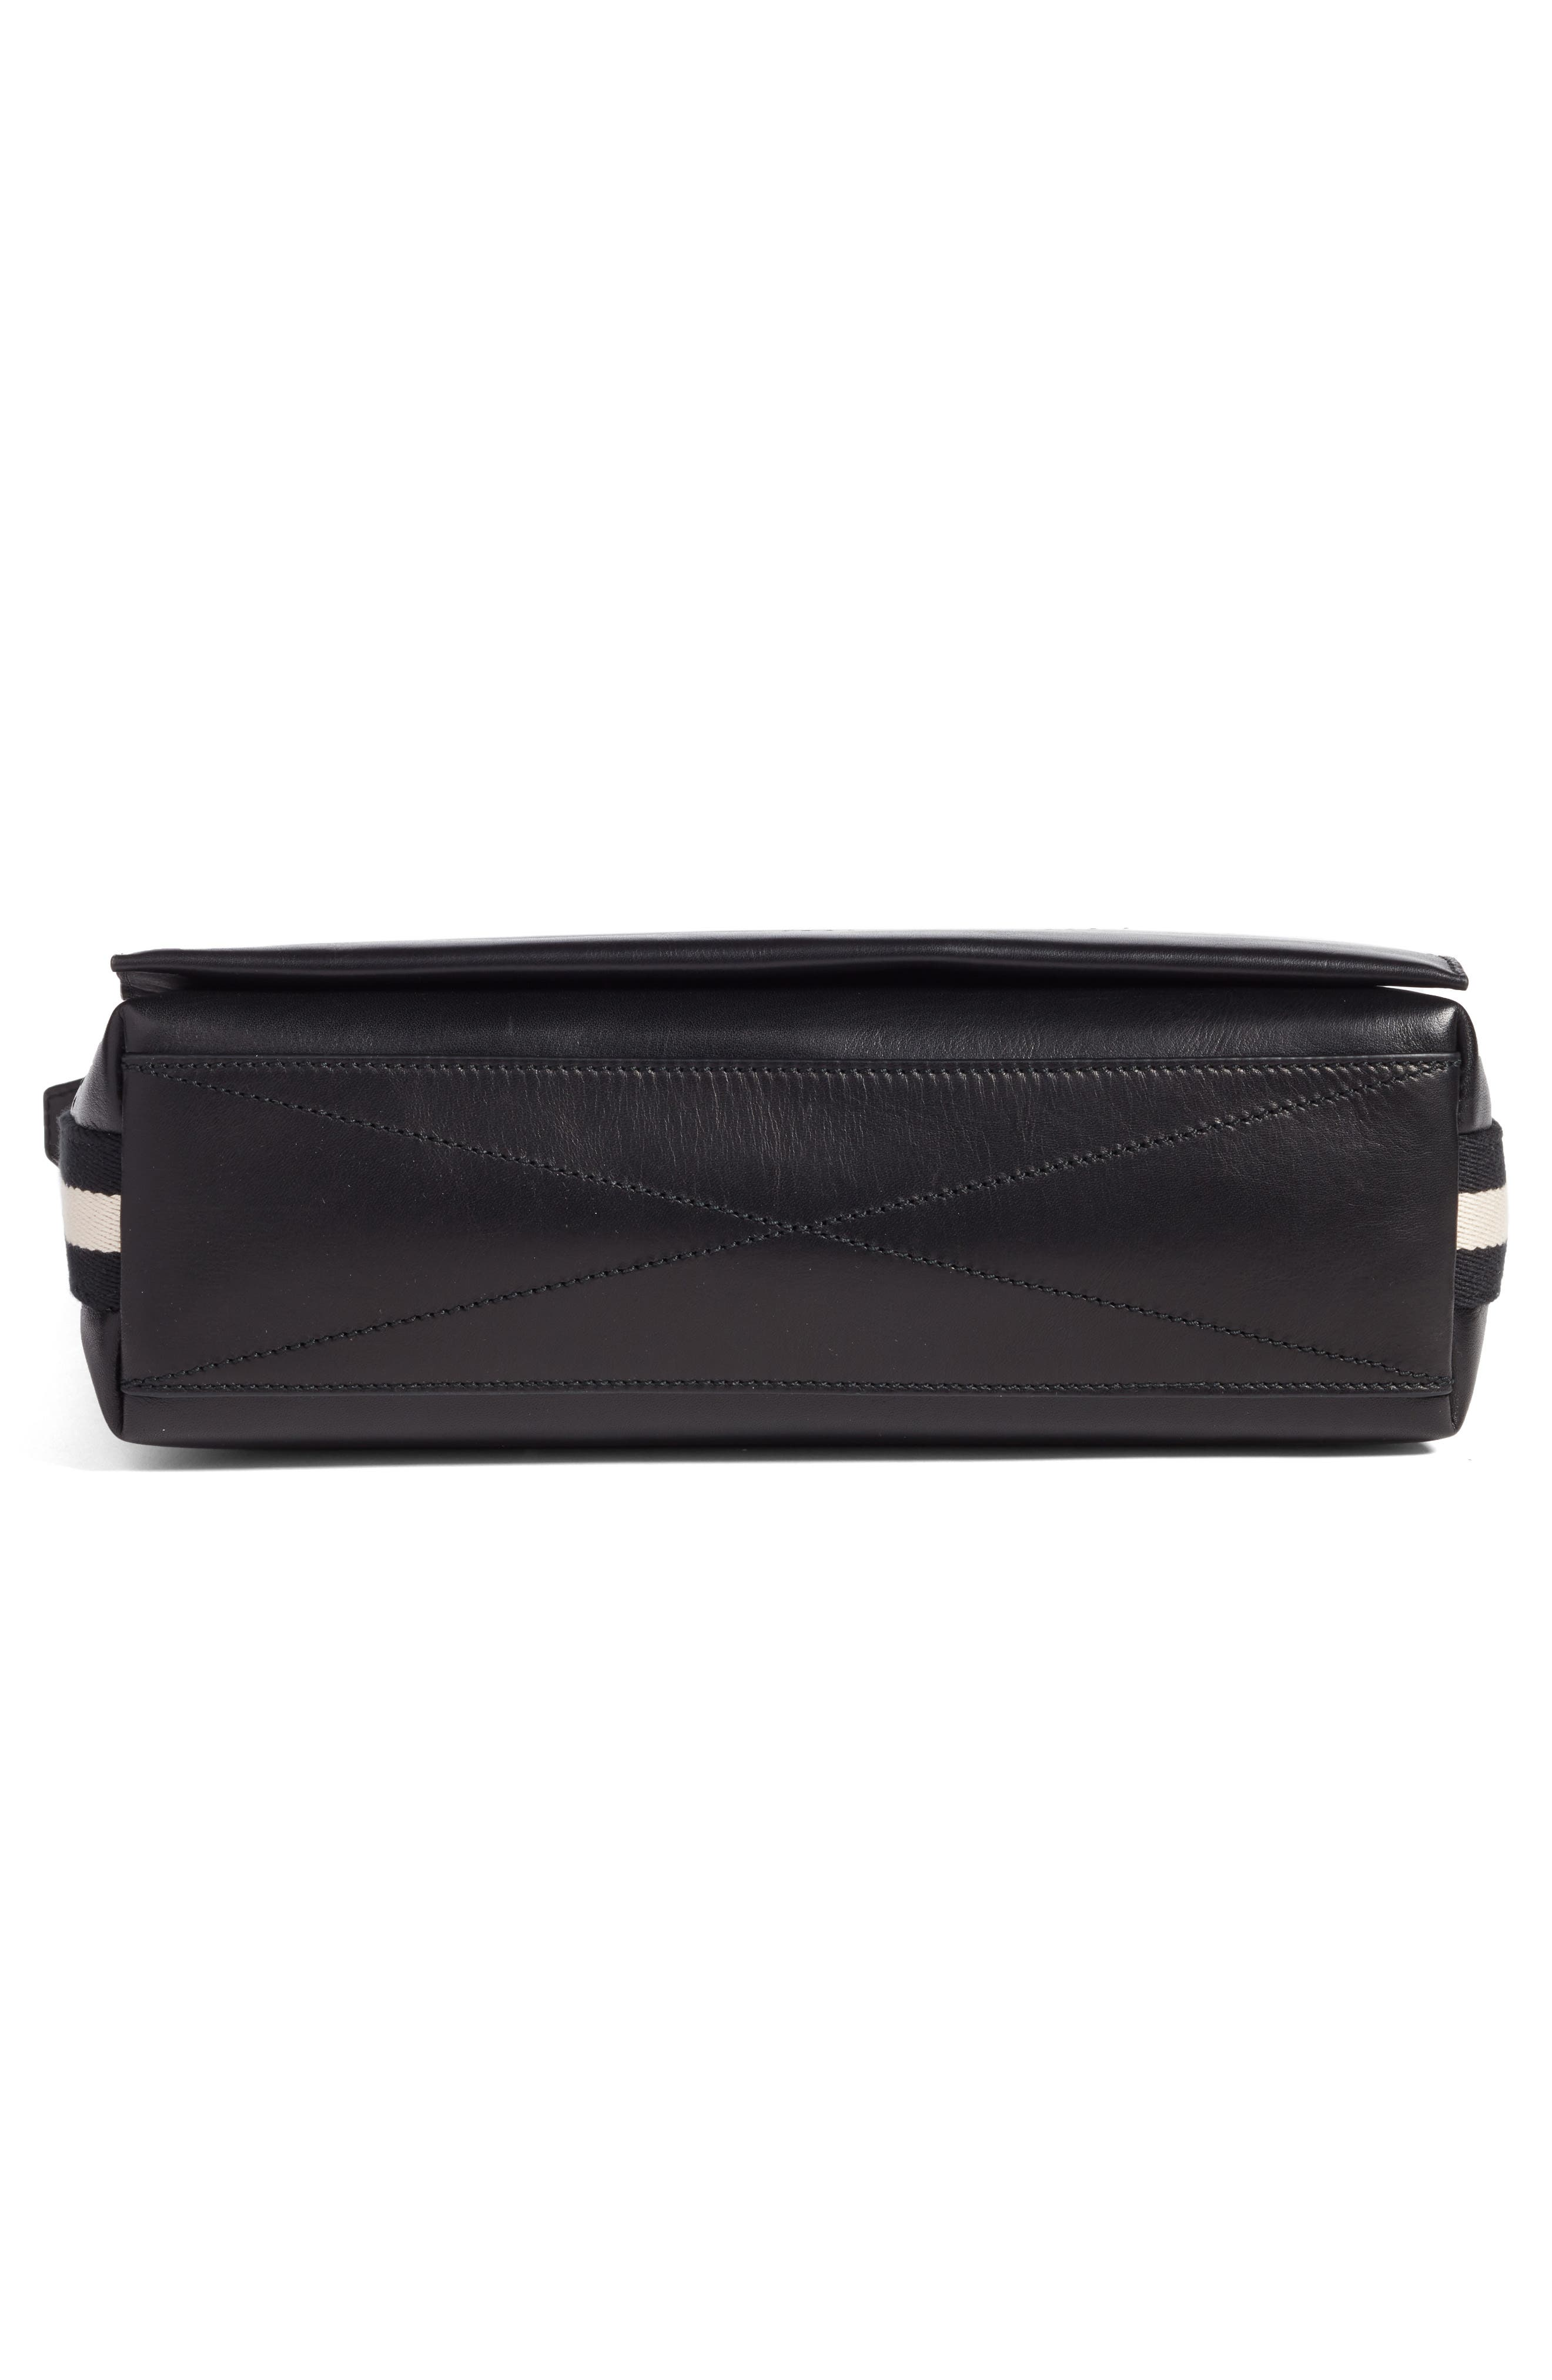 Tamrac Leather Messenger Bag,                             Alternate thumbnail 6, color,                             001